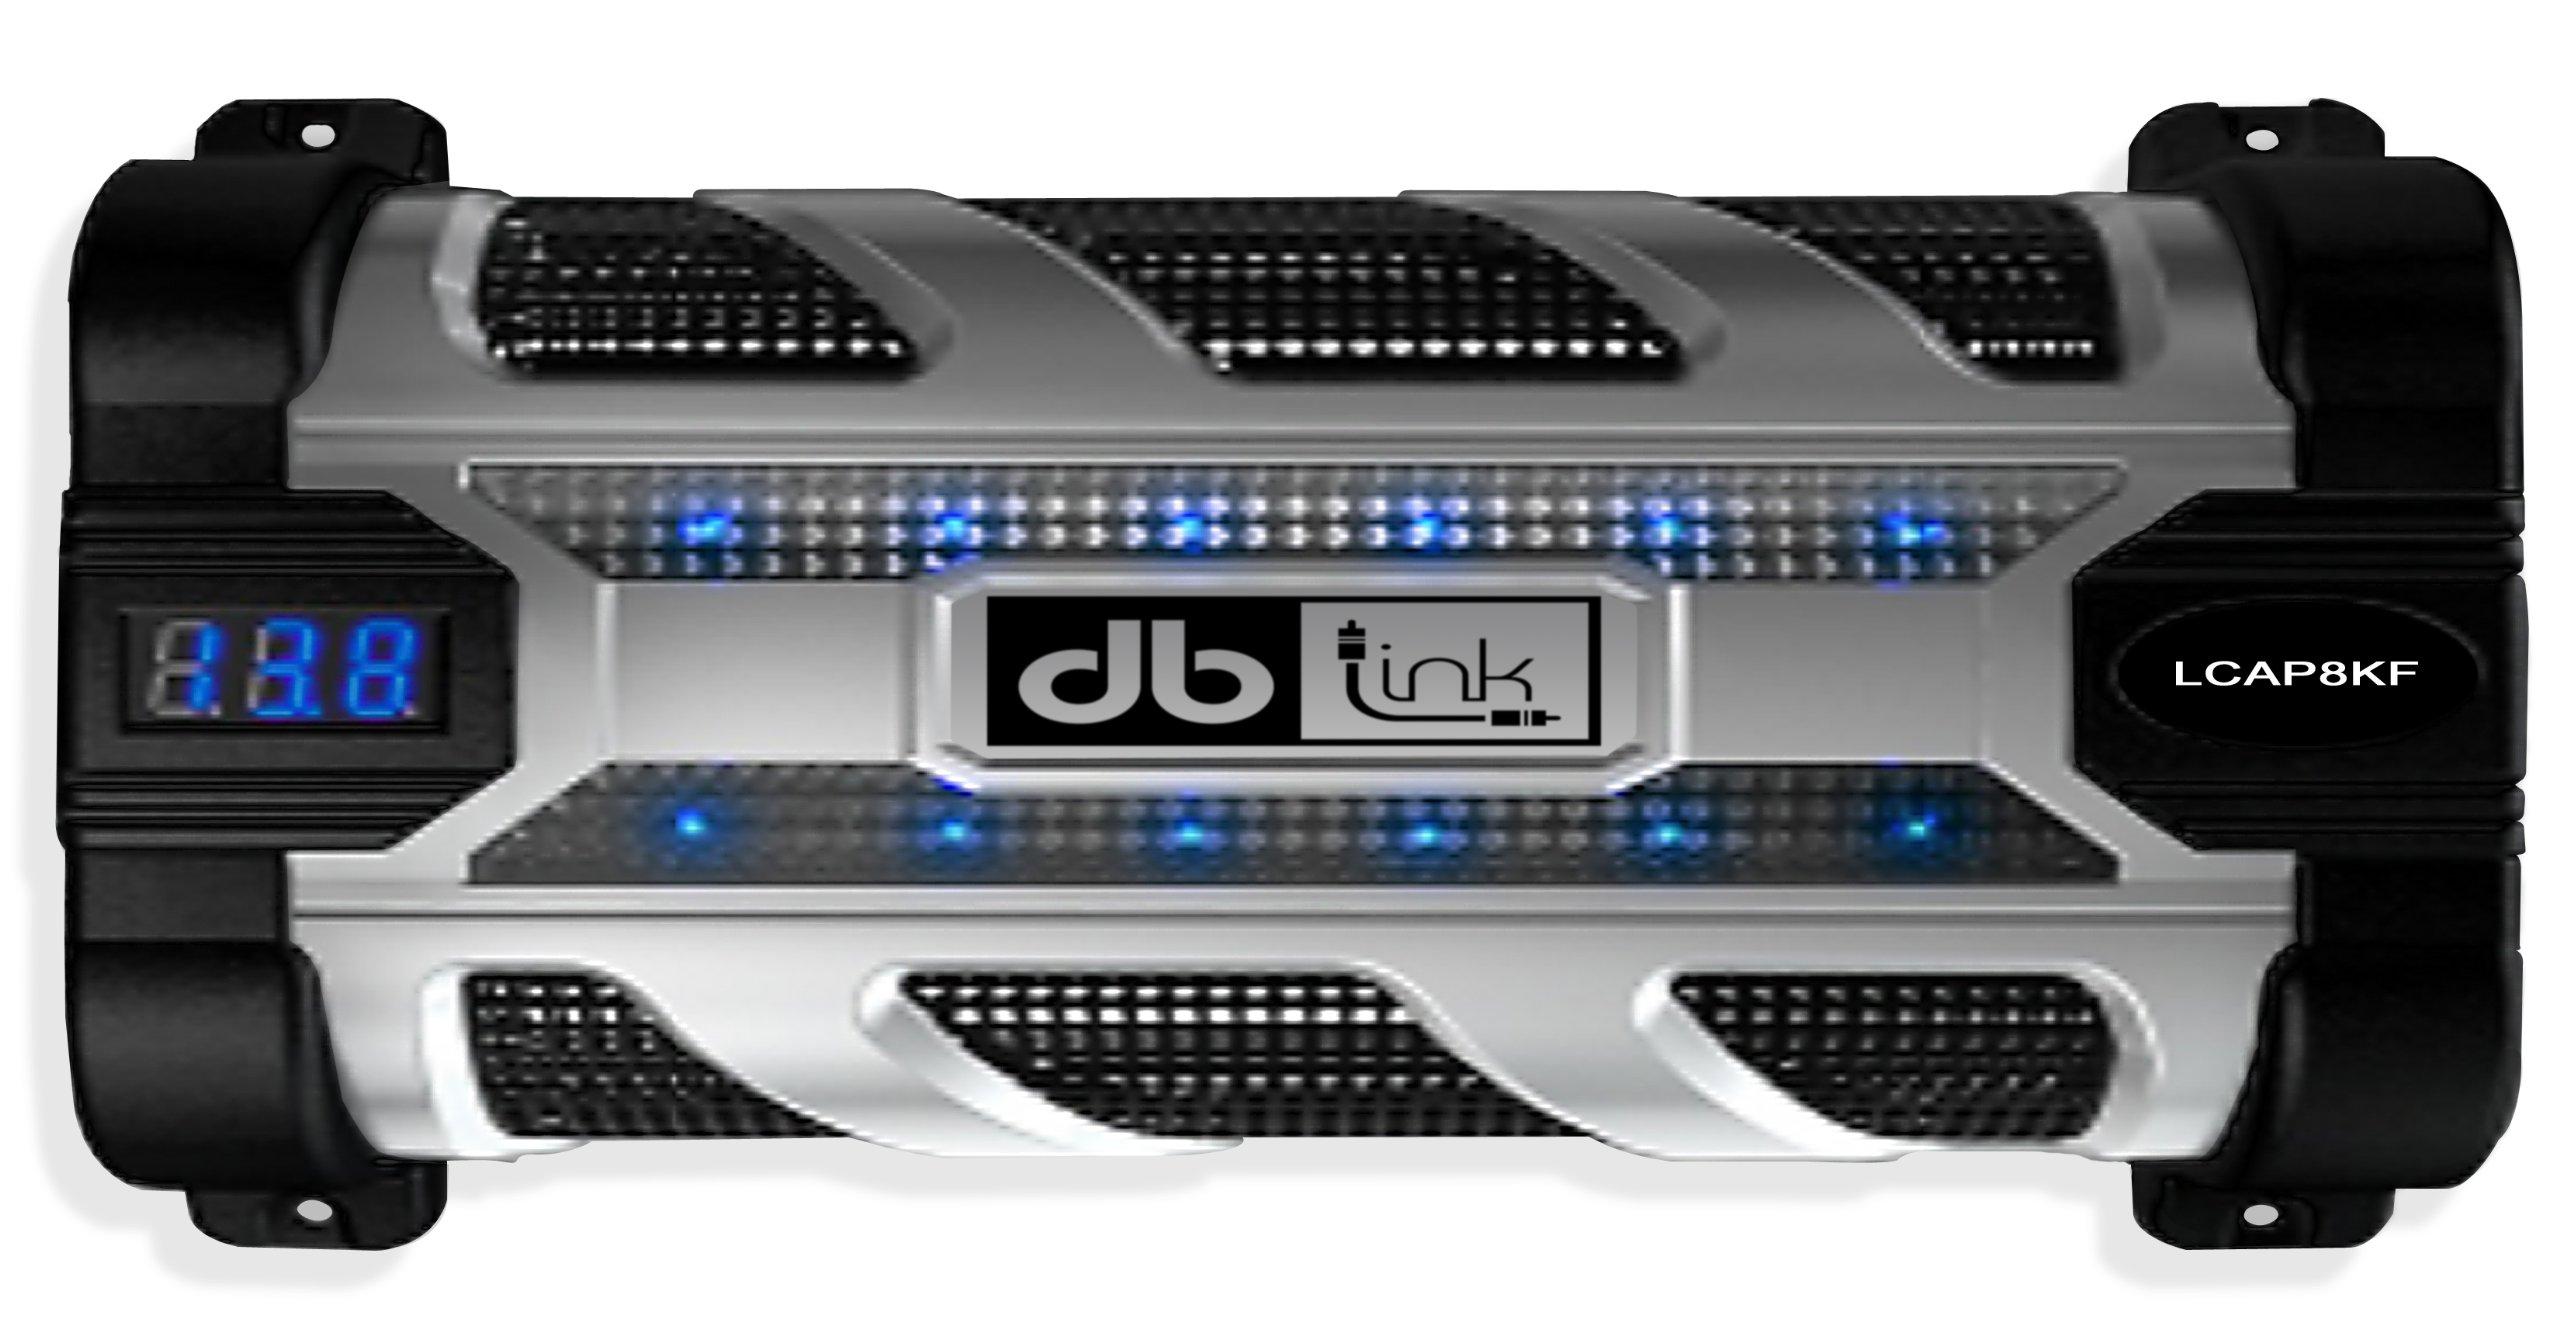 DB Link LCAP8KF 8 Farad Capacitor